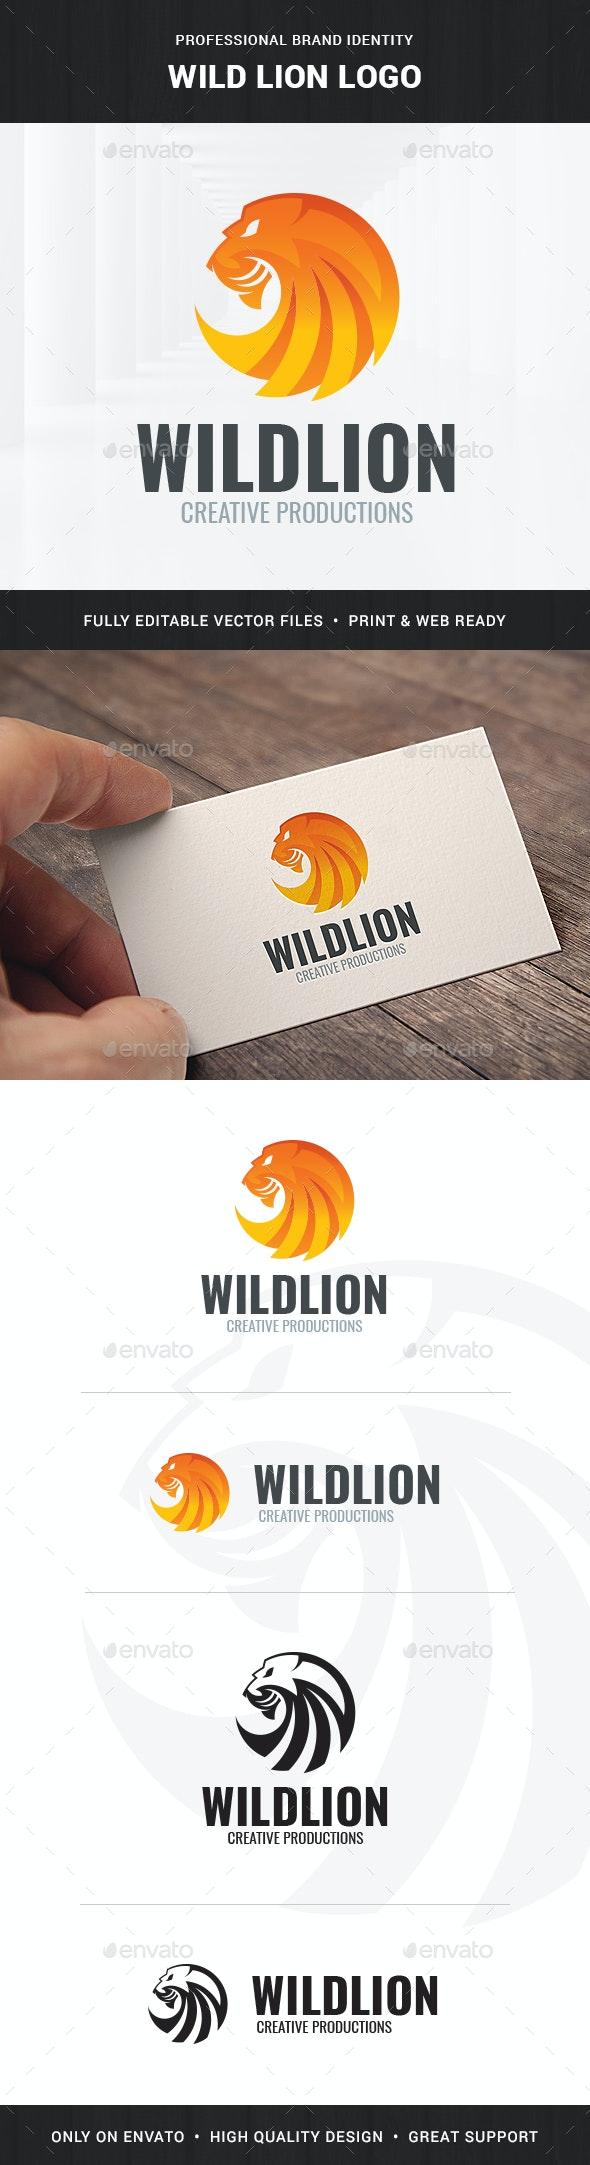 Wild Lion Logo Template - Animals Logo Templates